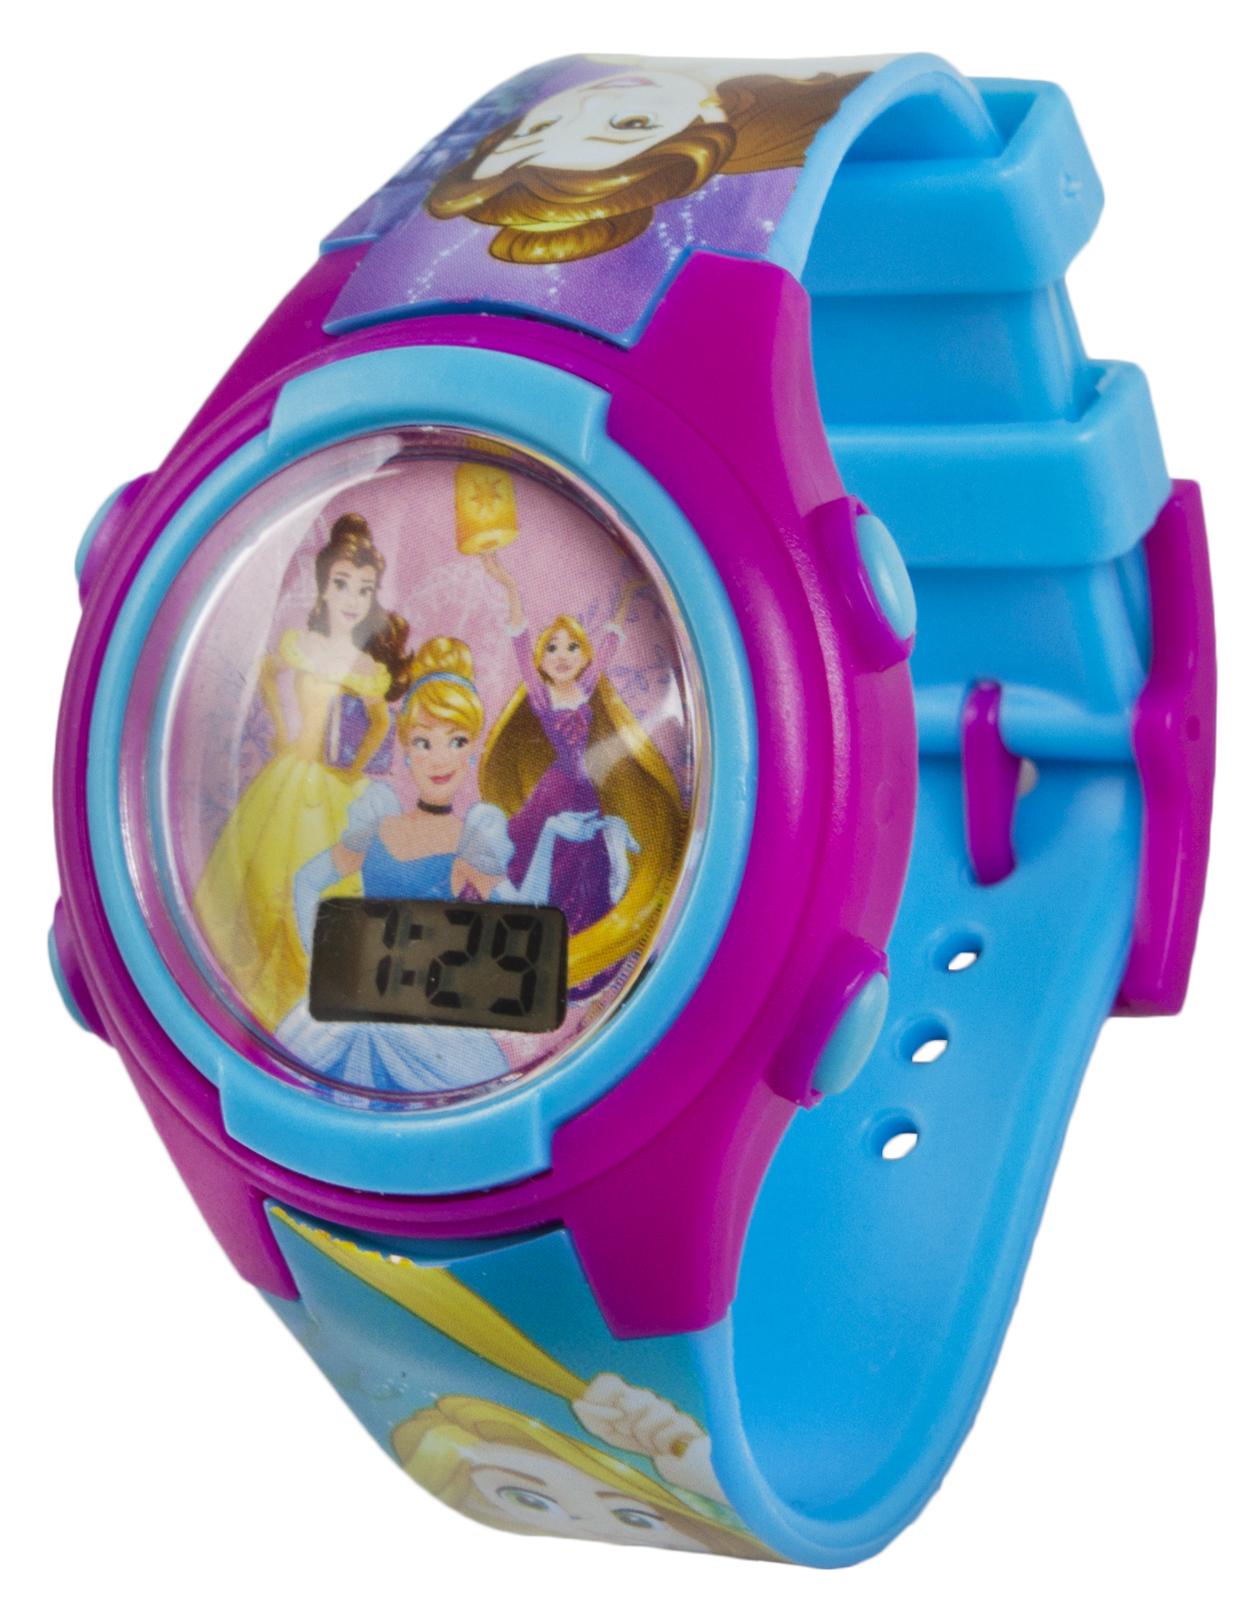 Kids Character Digital Wrist Watch + Presentation Tin Xmas ...